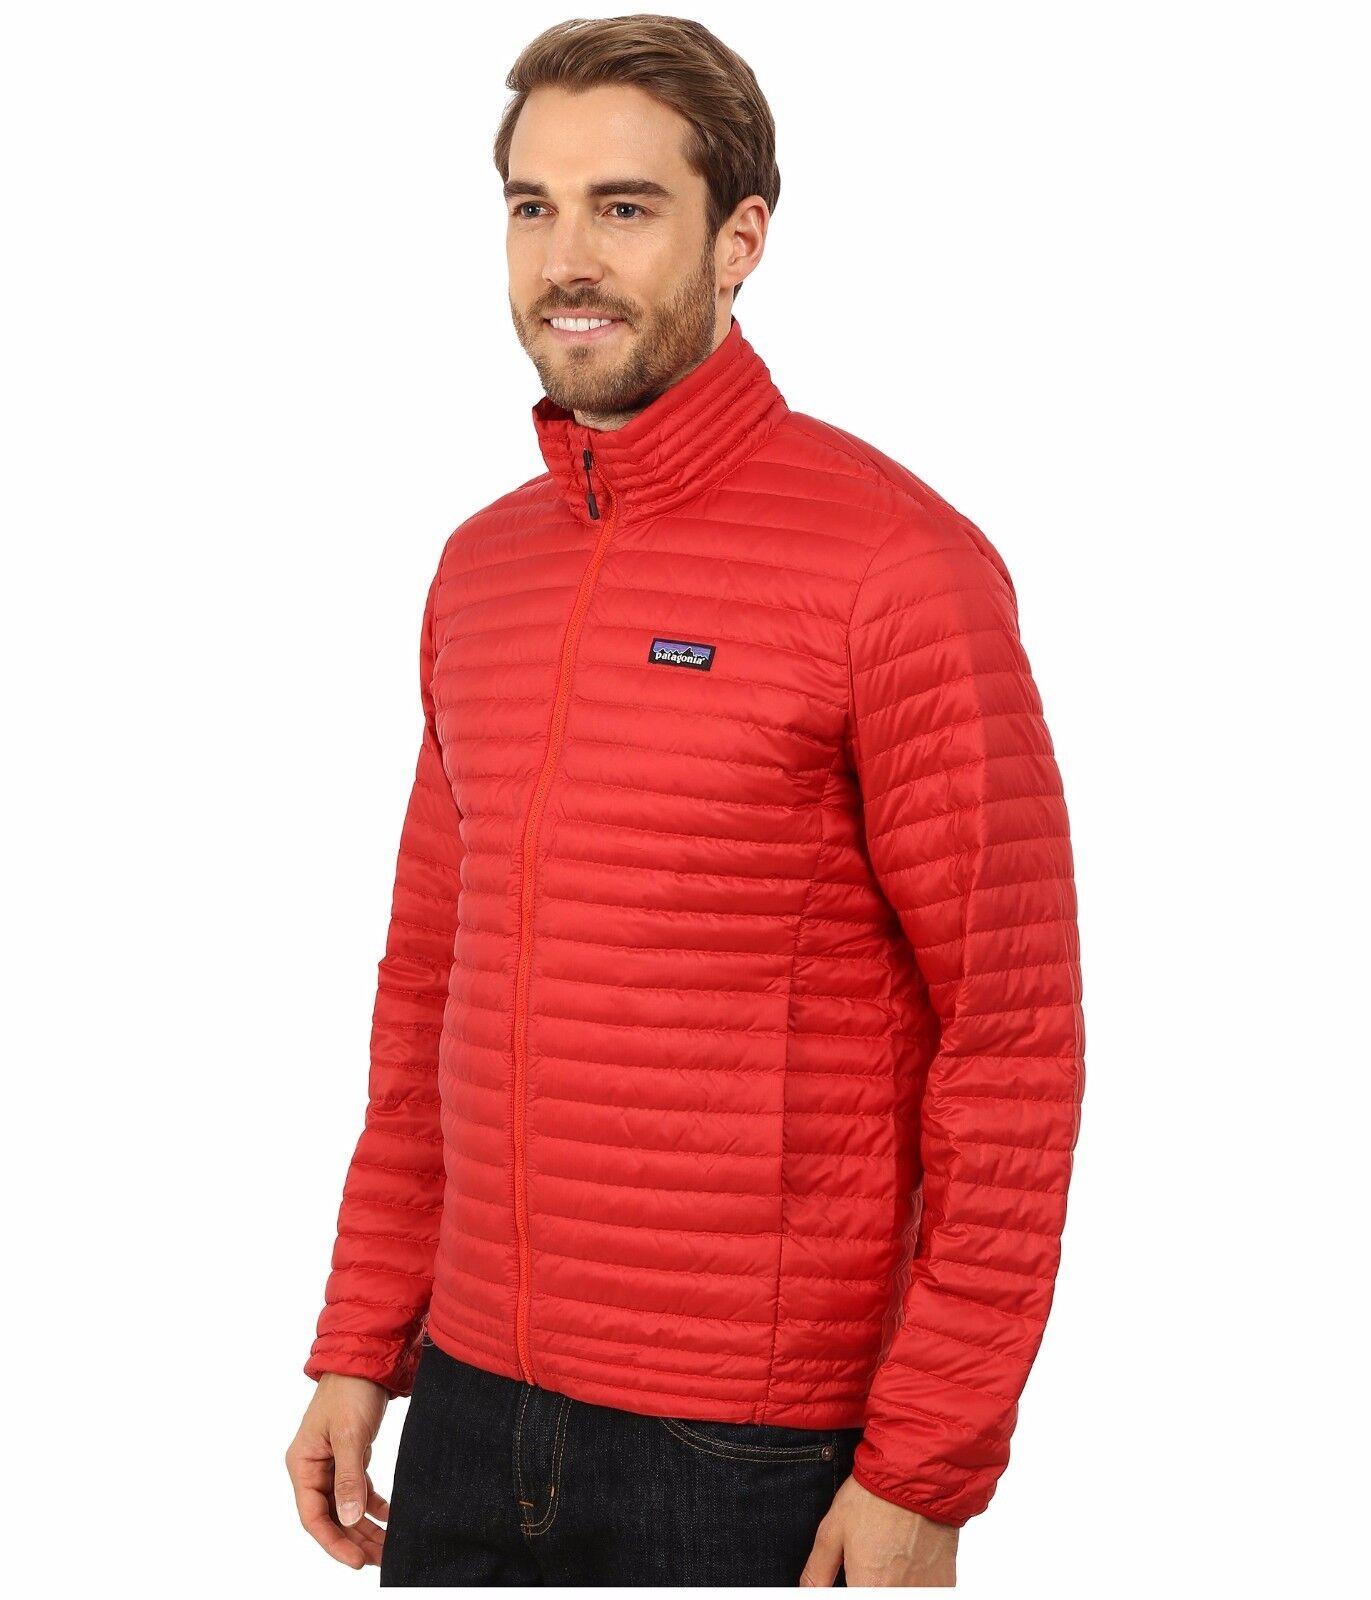 ÚJ Patagonia Down Shirt Jacket Férfi 600 Fill Goose Red Méret XL 2XL NTW $ 199